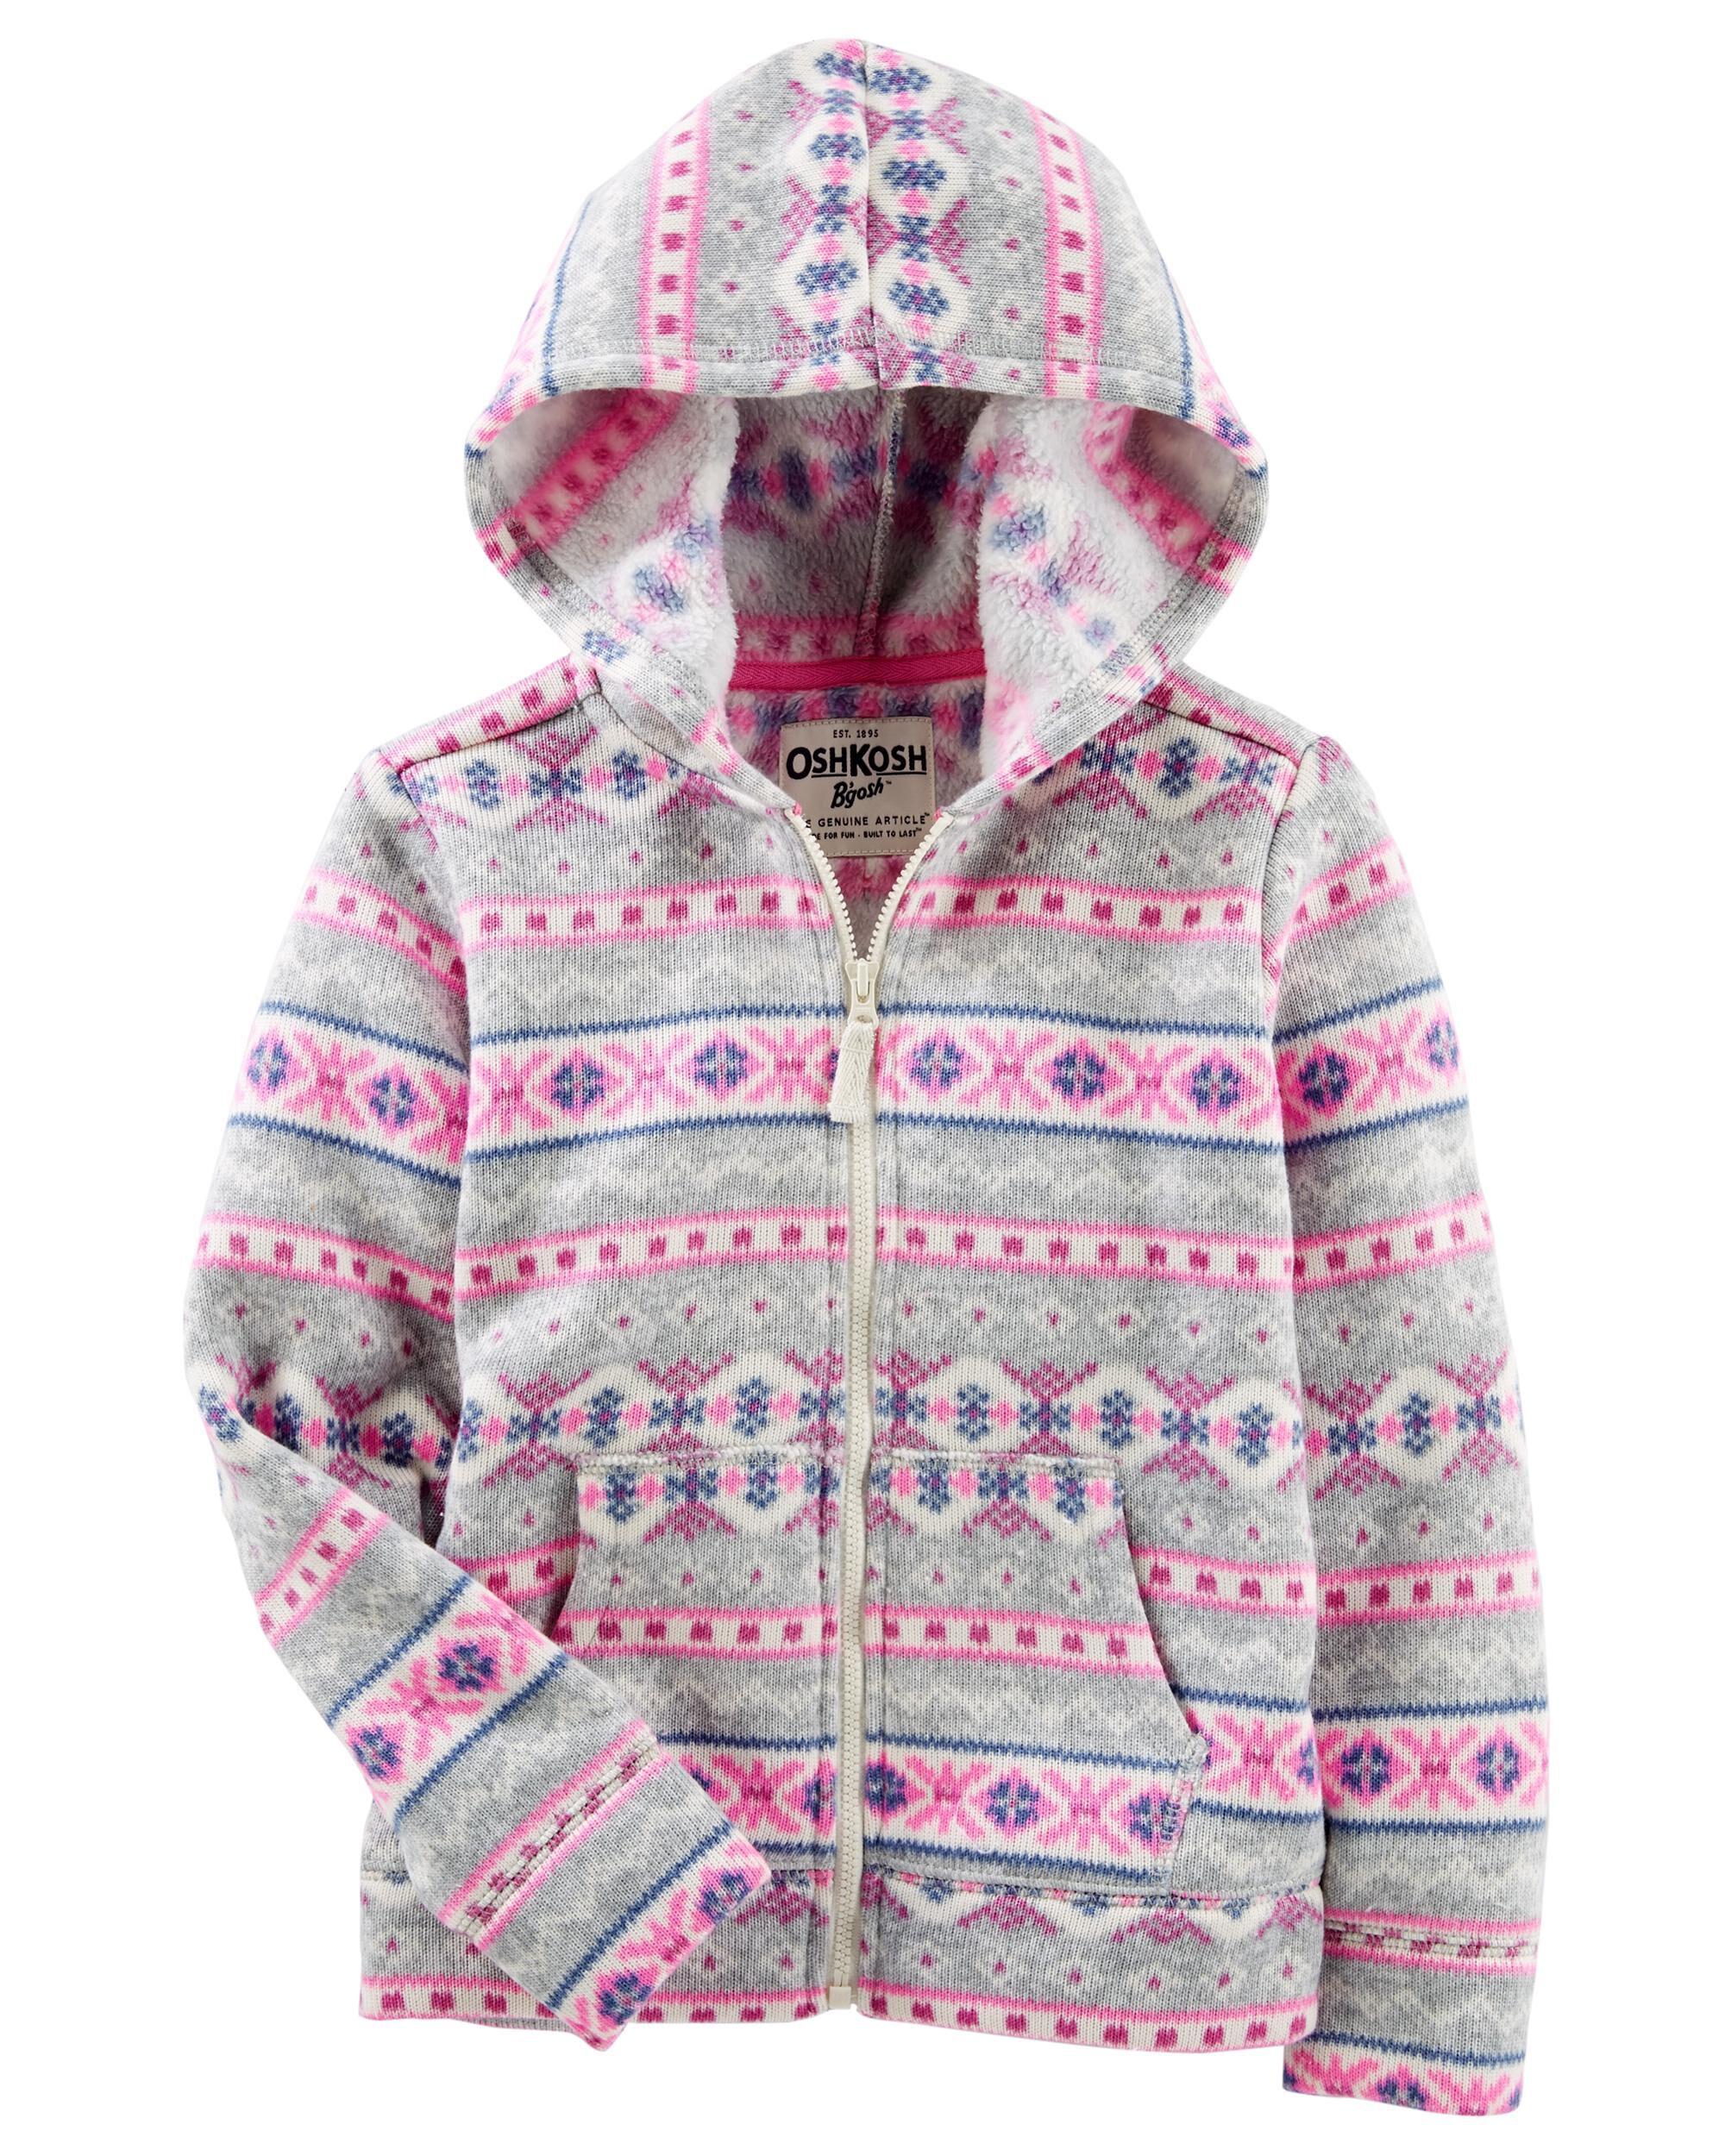 Fair Isle Sweater-Fleece Jacket   OshKosh.com